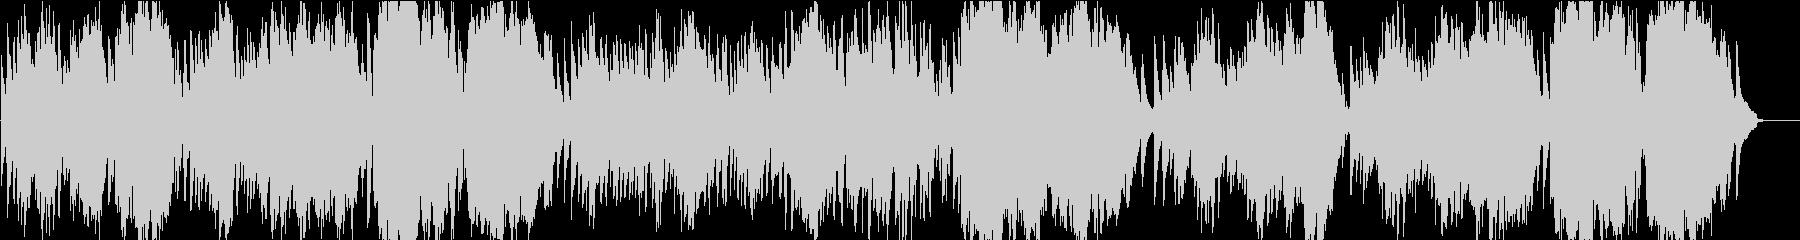 Chopin's melancholy atmosphere in Waltz C sharp minor's unreproduced waveform